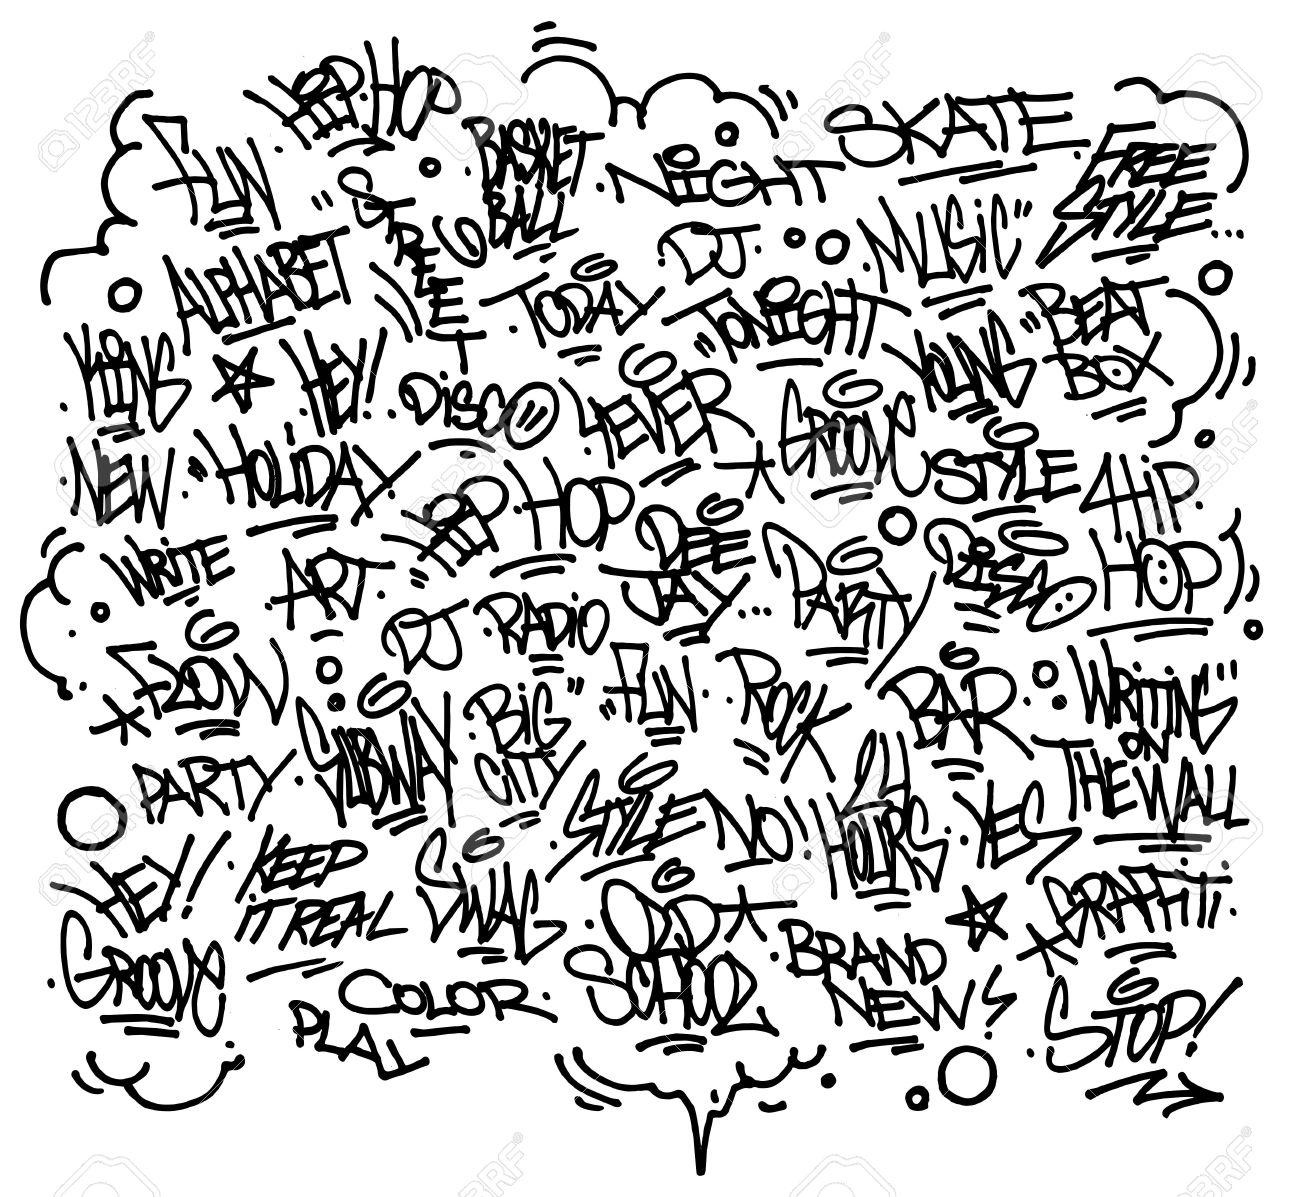 Multiple urban art and graffiti tags slogans decorations vector stock vector 23856859